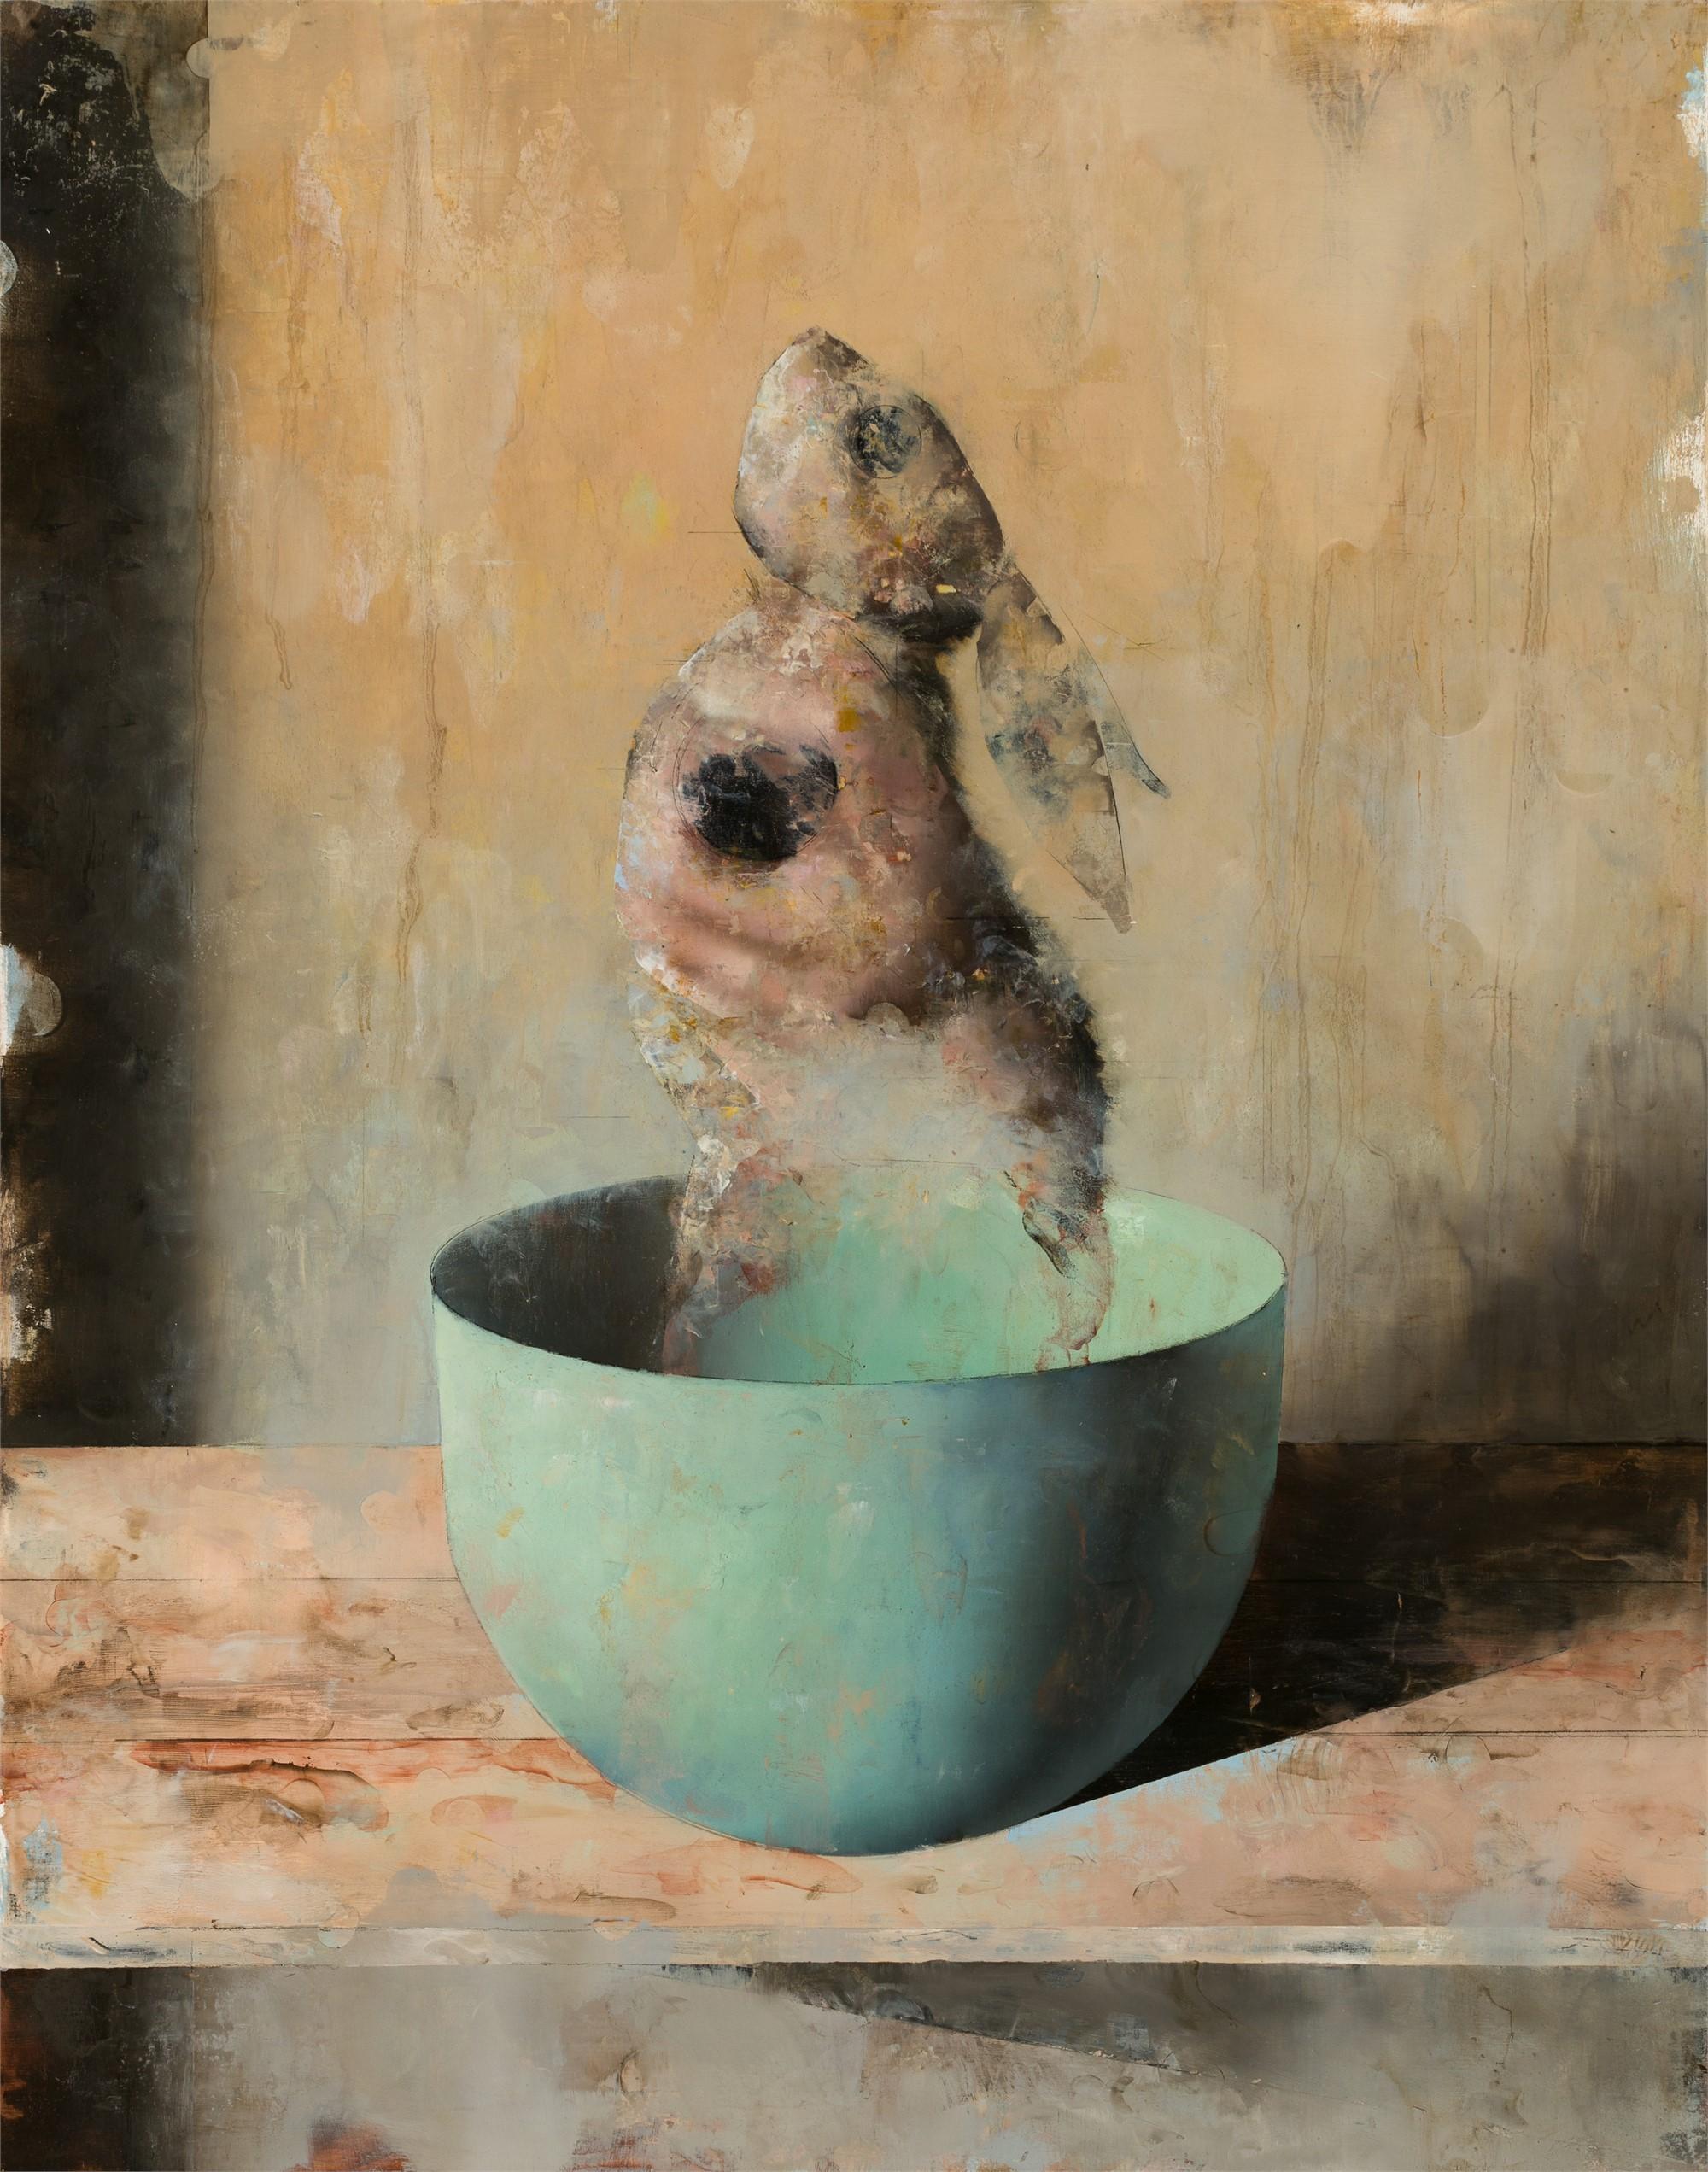 Glass and Flesh by Matthew Saba